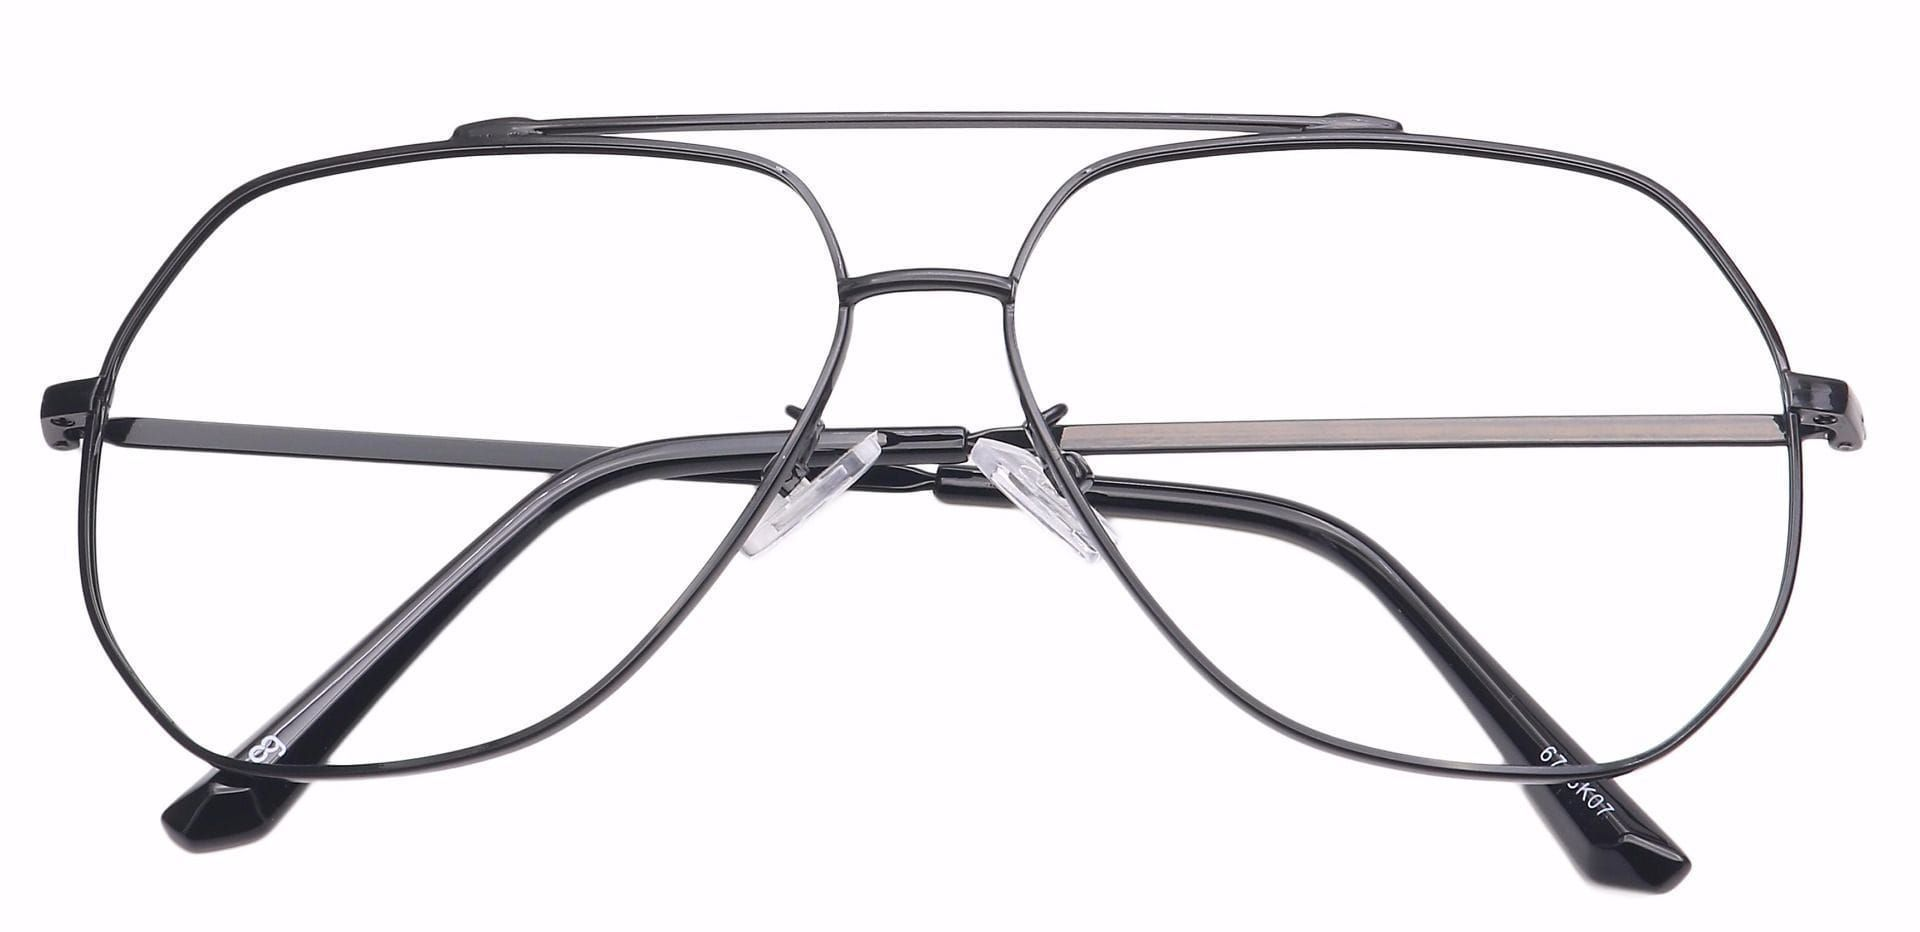 Flair Aviator Eyeglasses Frame - Black